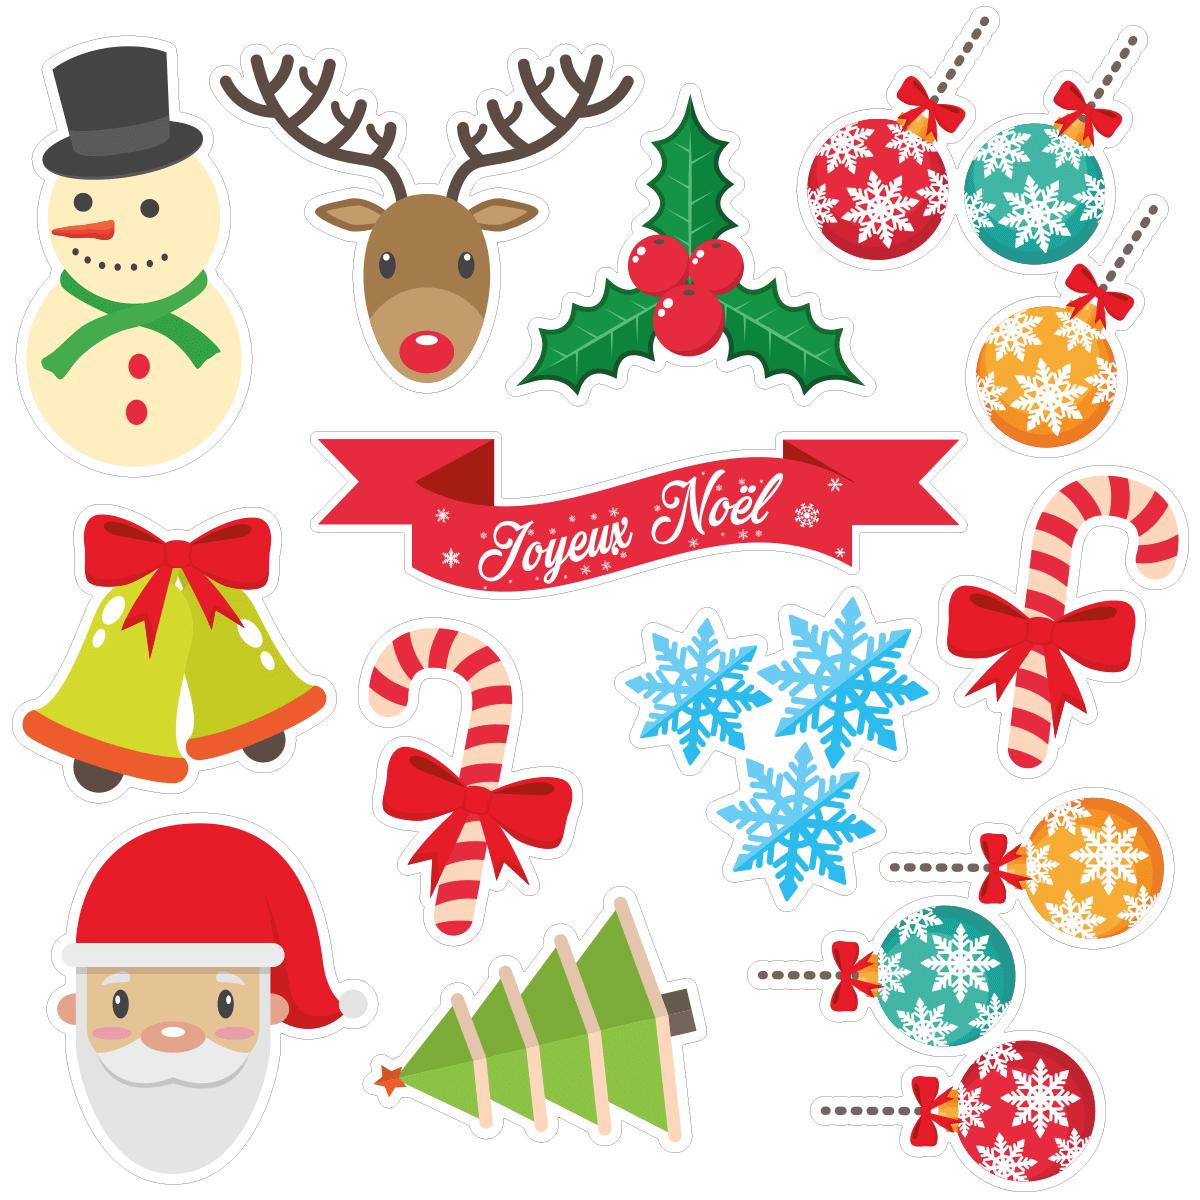 Chanson Joyeux Noel.Sticker Noel Joyeux Noel Pour Enfant